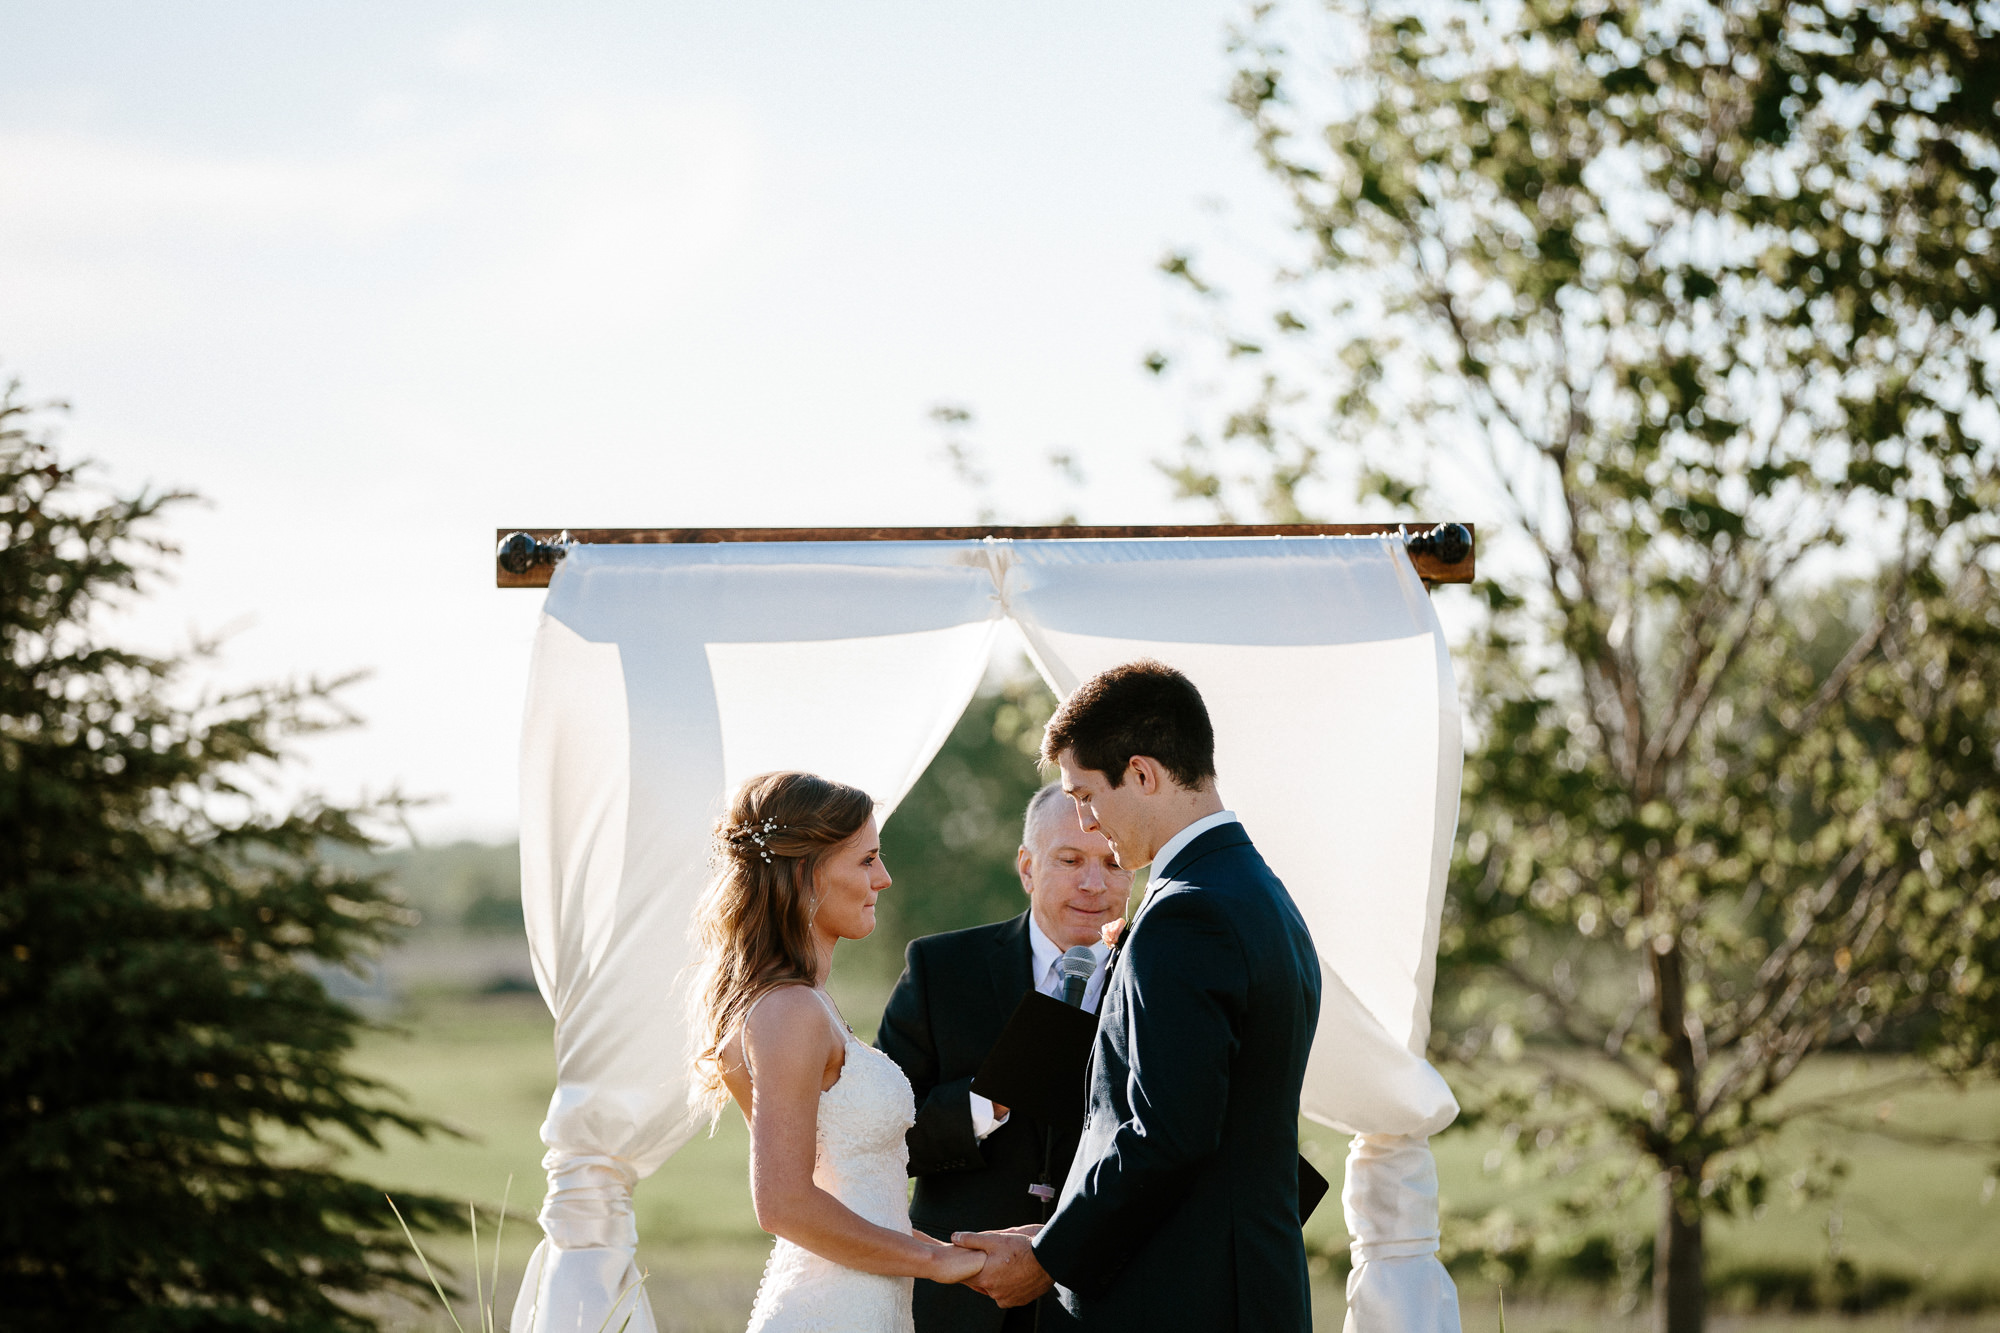 wedding-elopement-adventerous-romantic-timeless-south-dakota-blue-haven-barn-044.jpg